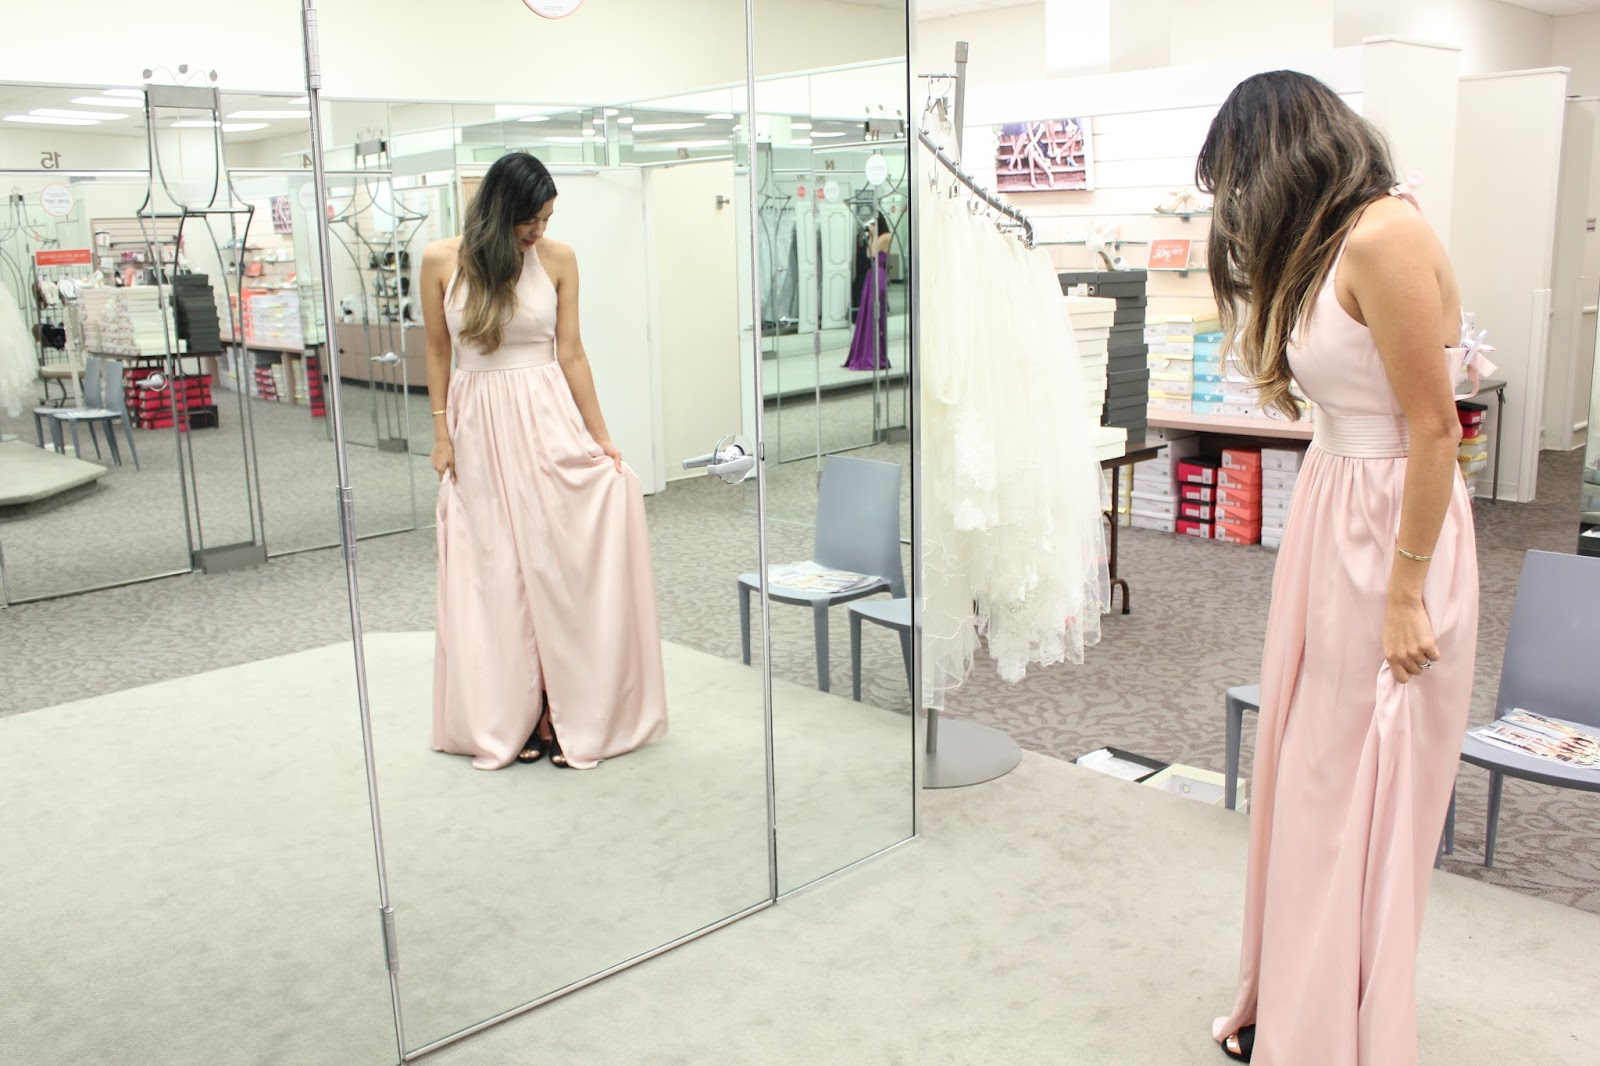 433bb4a2b887 Finding the Perfect Bridesmaid Dress | Viva Fashion